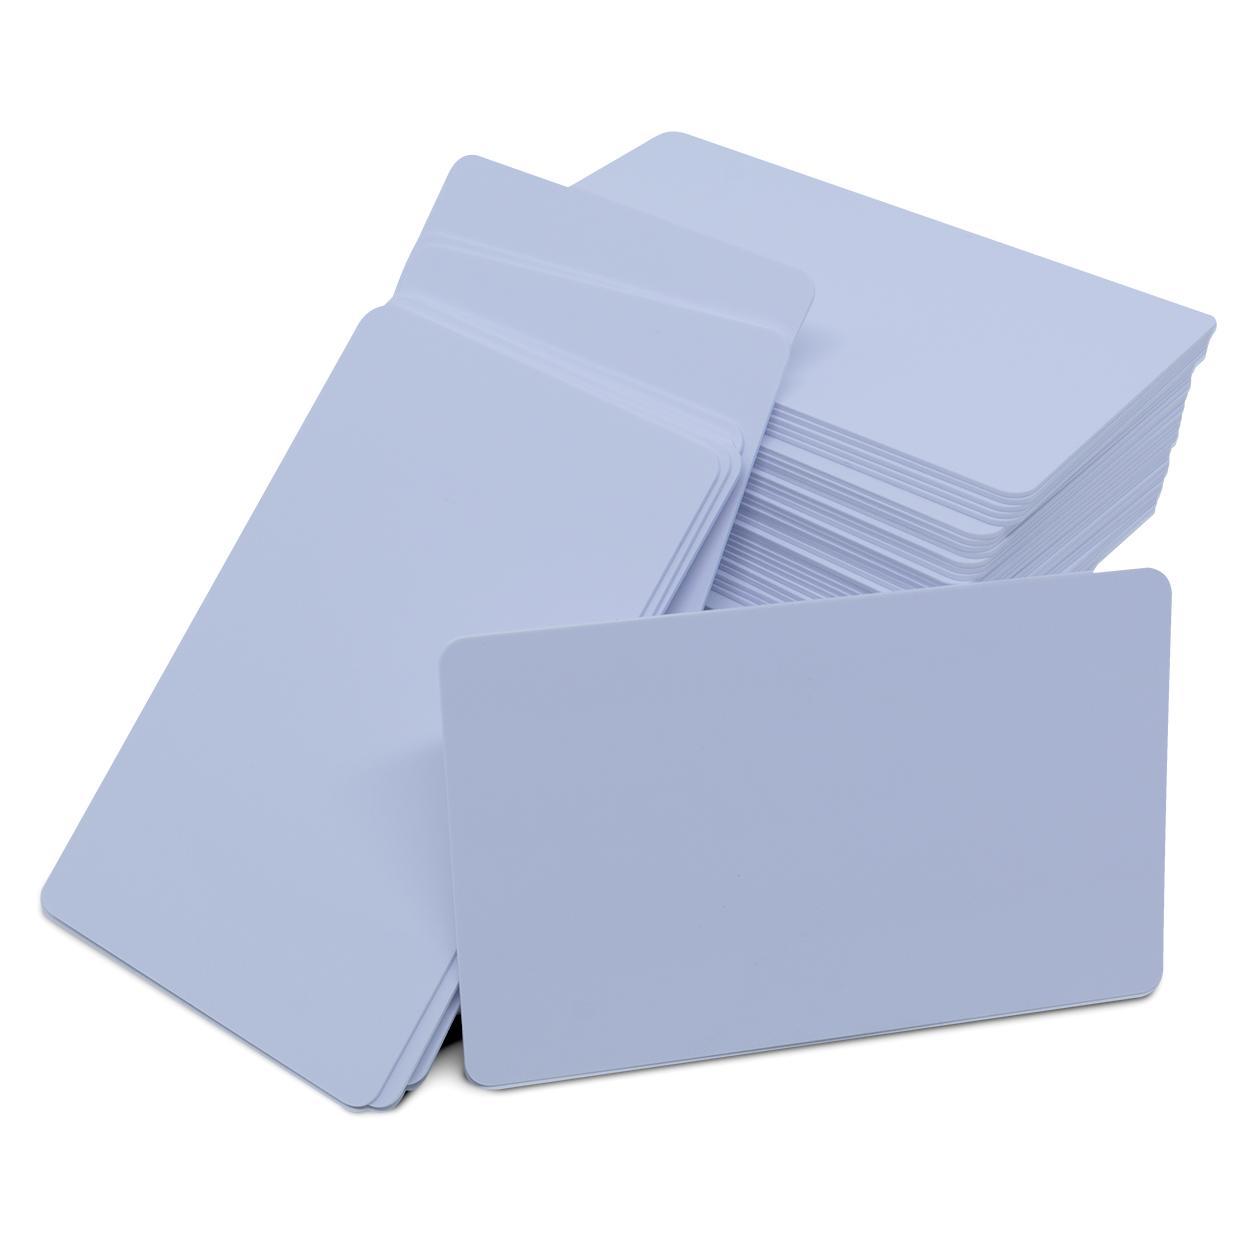 Cartão PVC Branco para Impressão Jato de Tinta - Sem Tarja